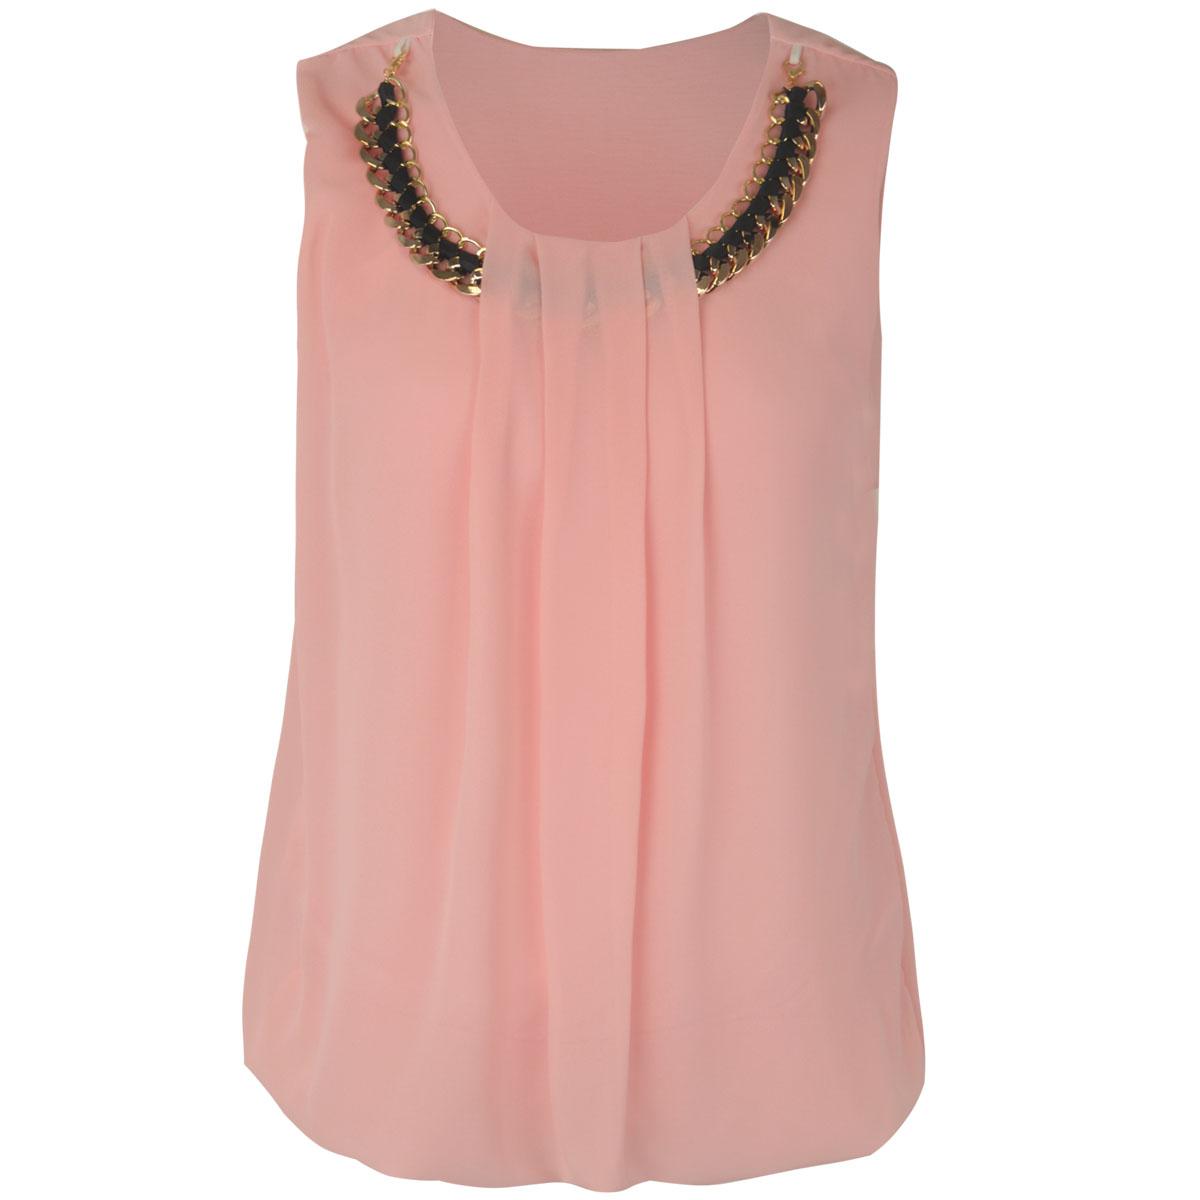 Elegant HOT SALE New Fashion Women Chiffon Blouse Formal Blouses Black Chiffon Blouse Womens Brand Tops ...